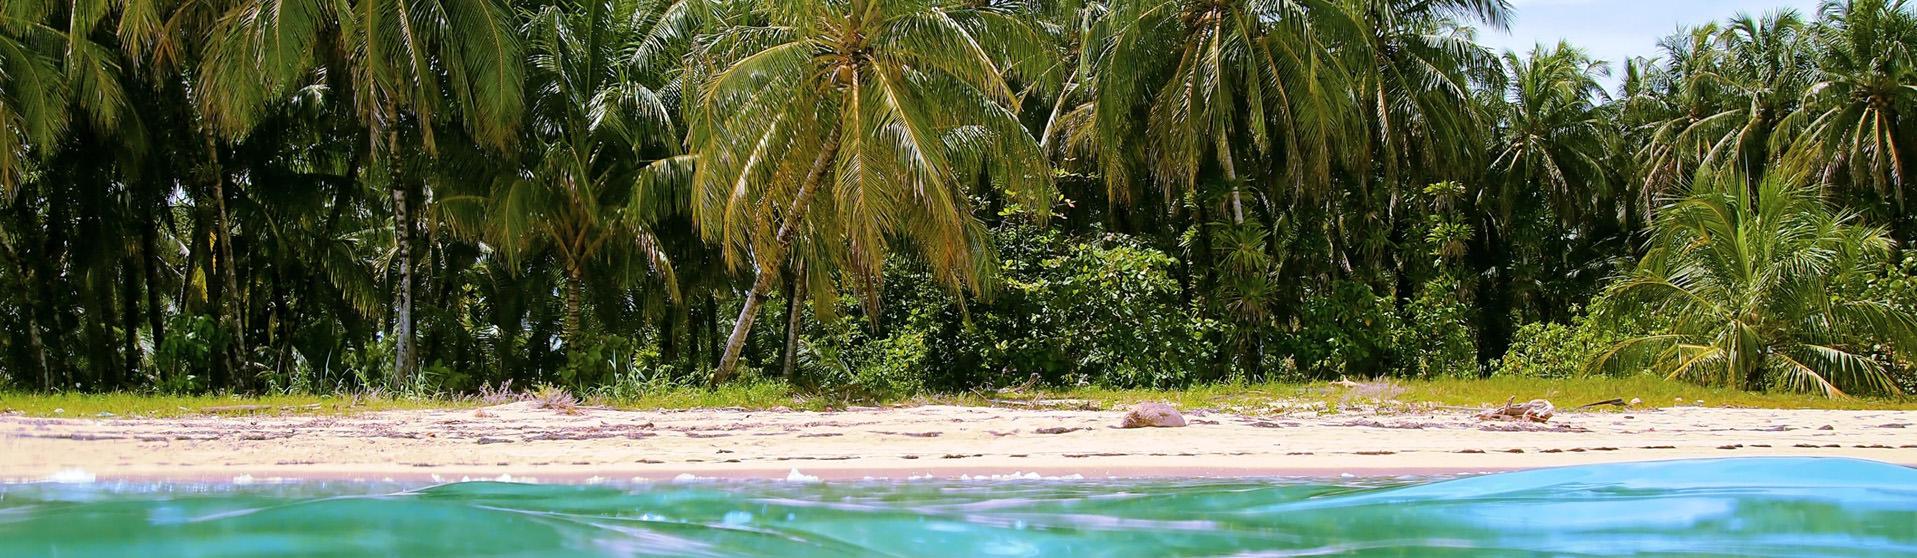 Cahuita Snorkeling & Rainforest Hike